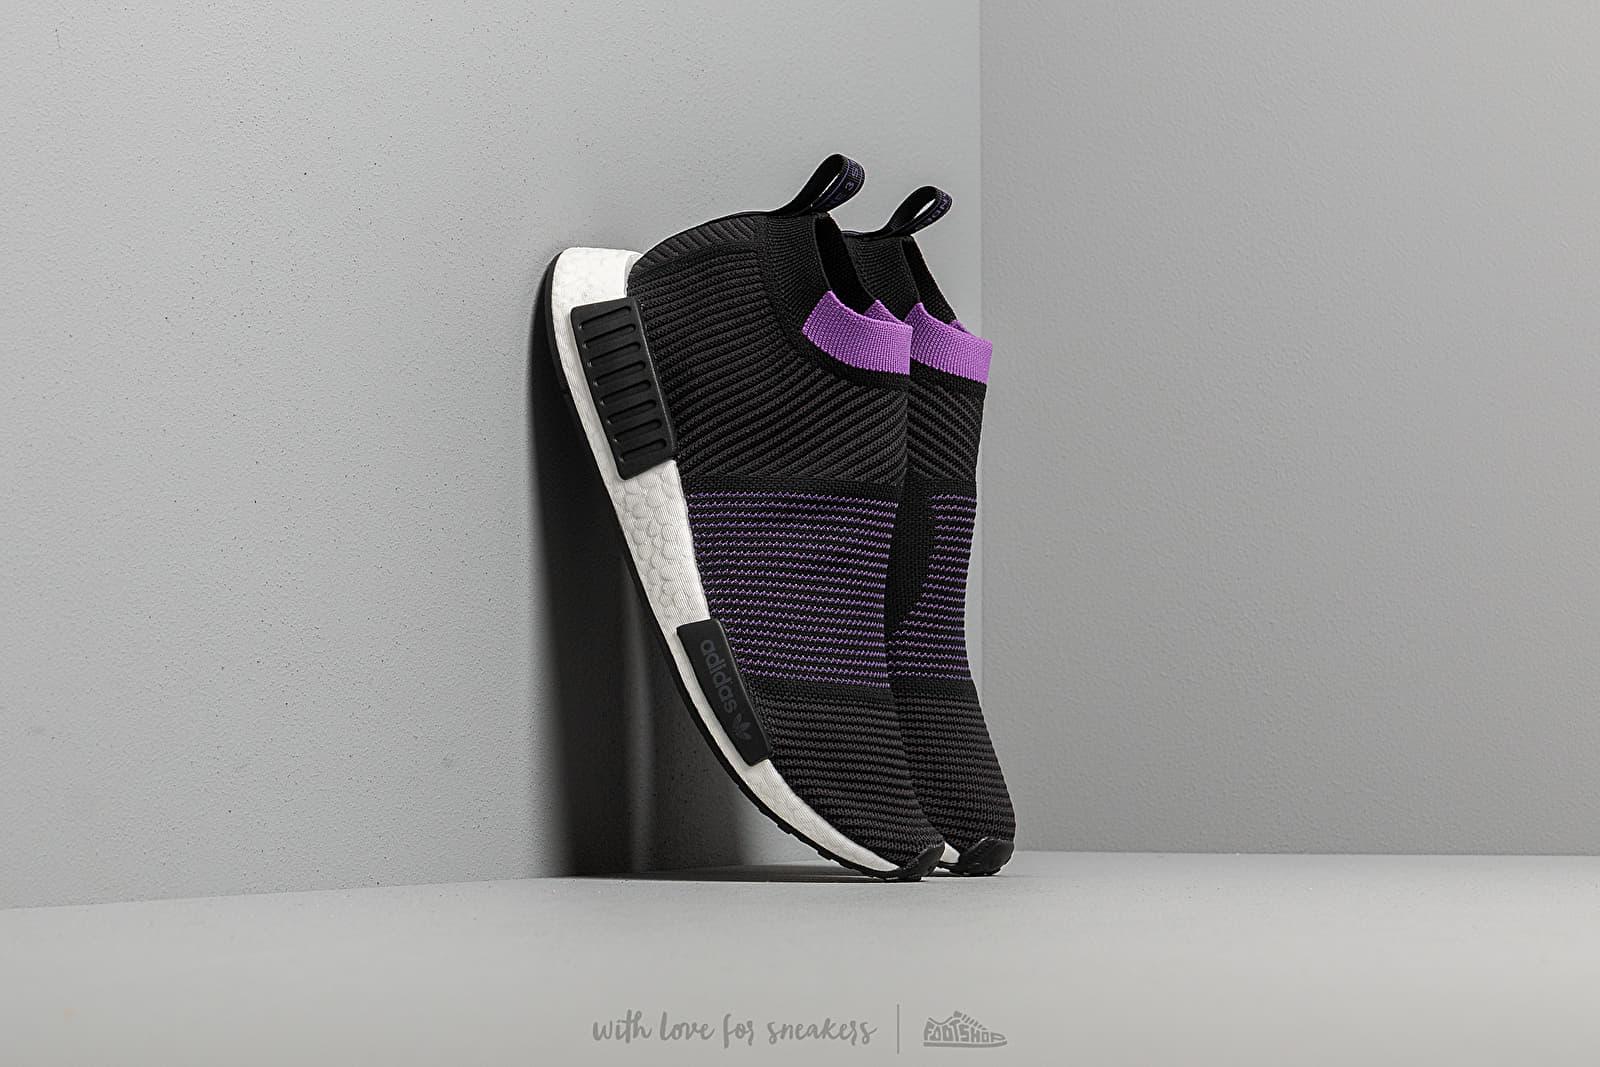 adidas NMD_CS1 PK W Core Black/ Carbon/ Active Purple at a great price $206 buy at Footshop